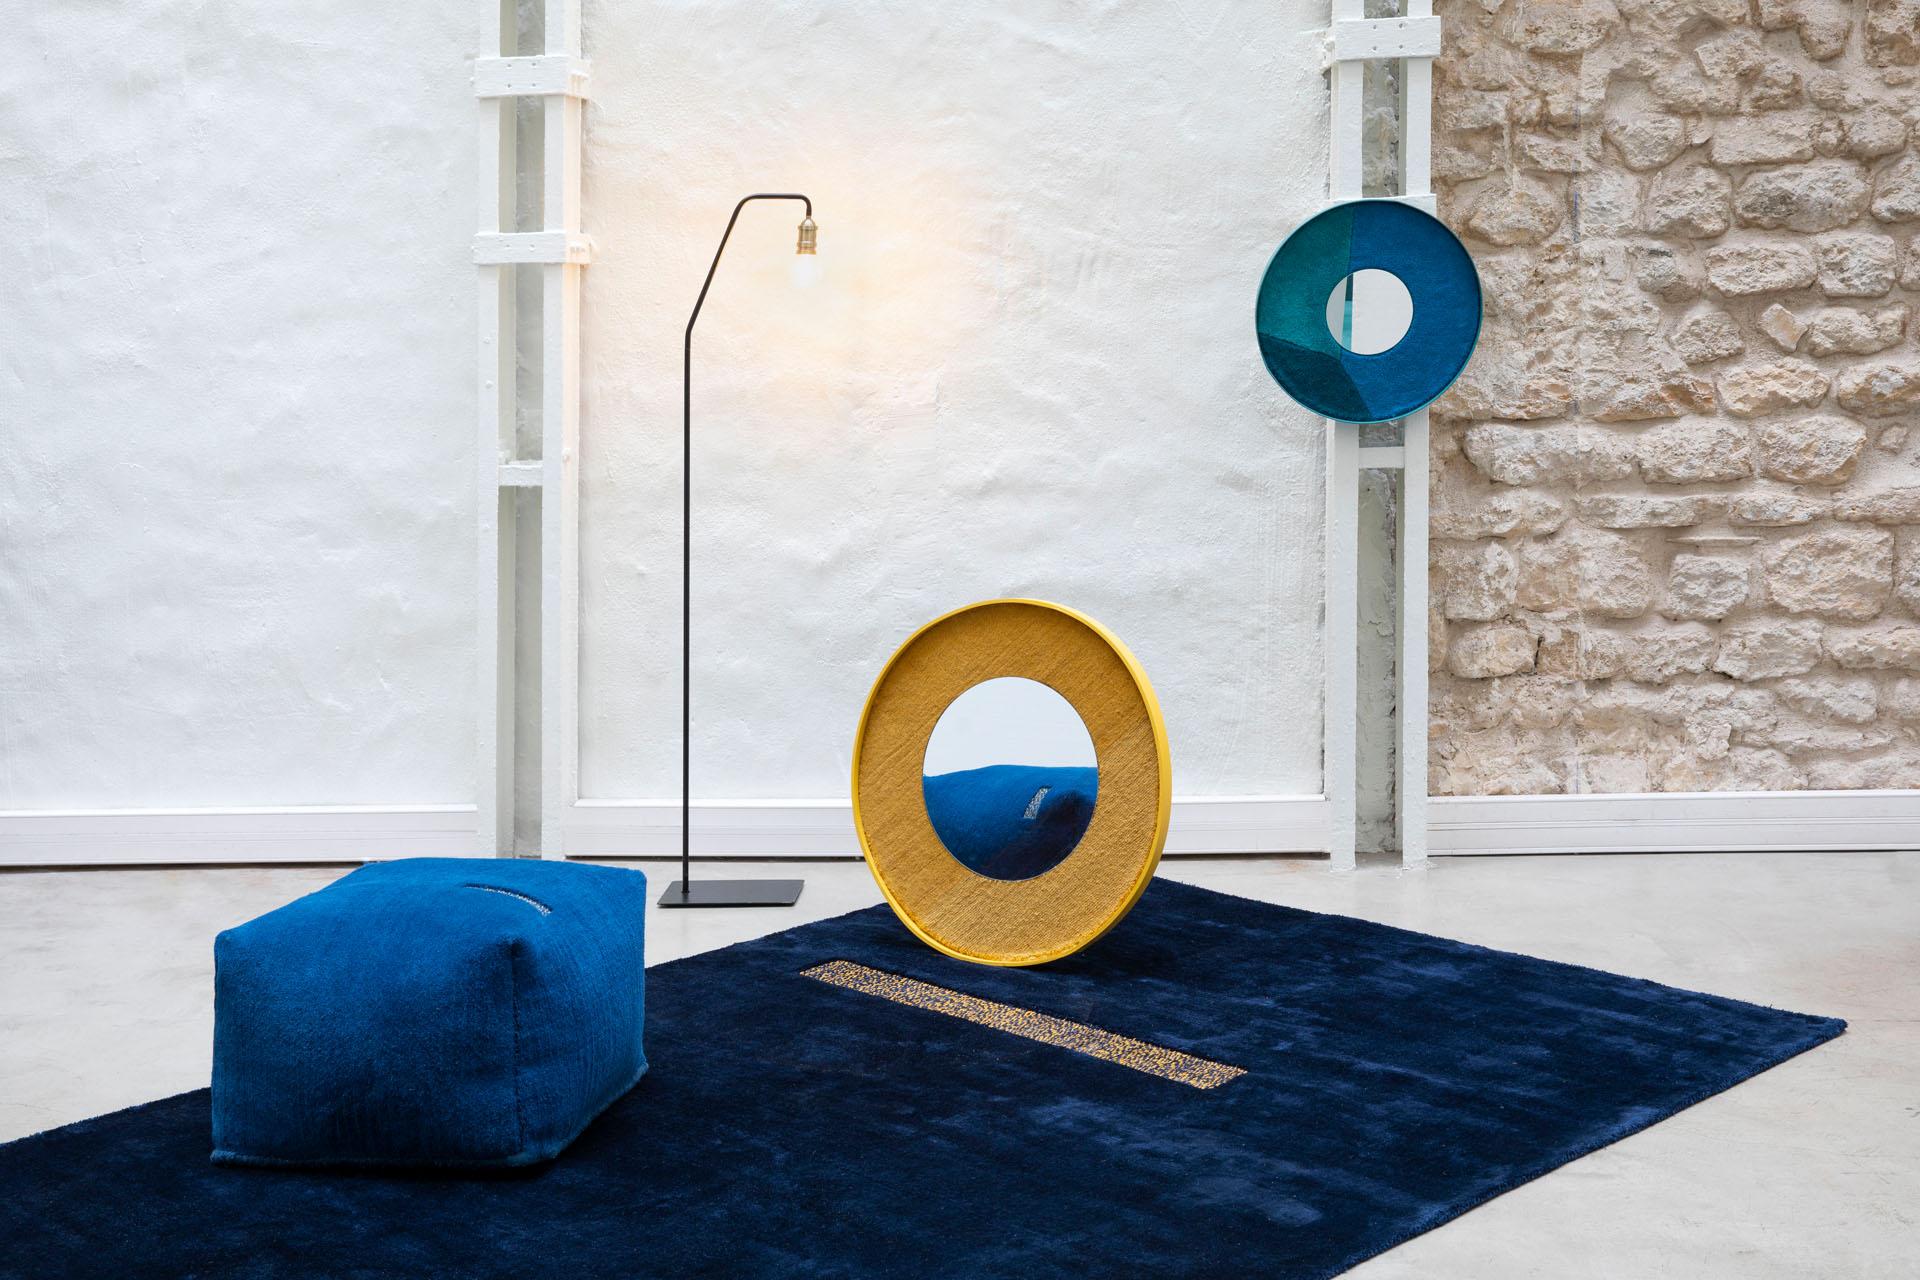 collection tapis upcyclé pour MADE.COM